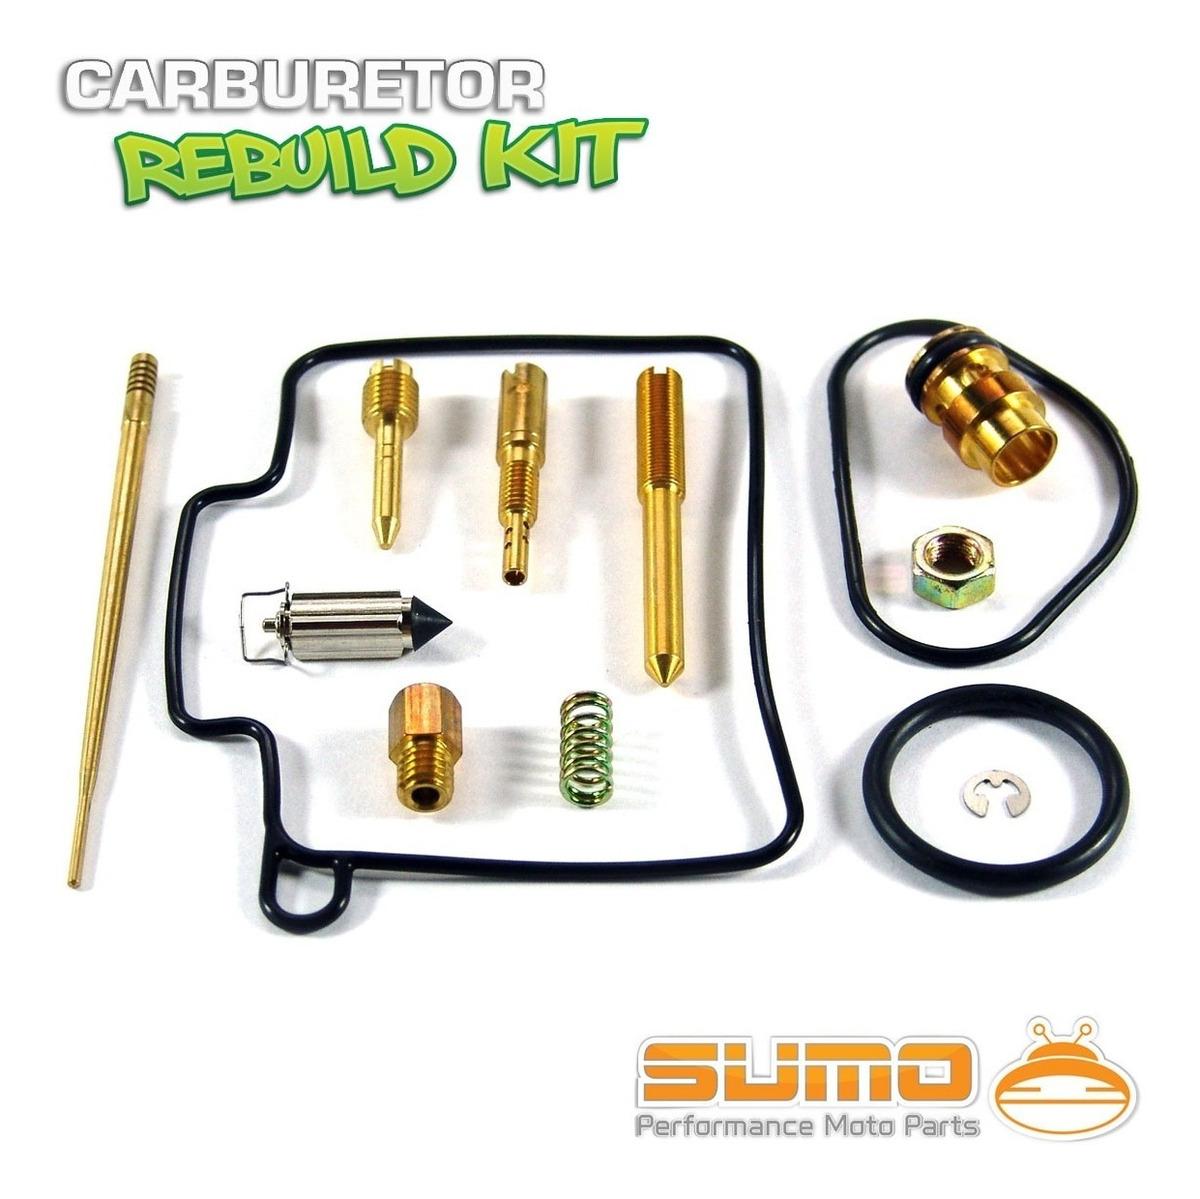 Kit Reparacion Carburador Suzuki Rm 125 (2001-2006) Rm125